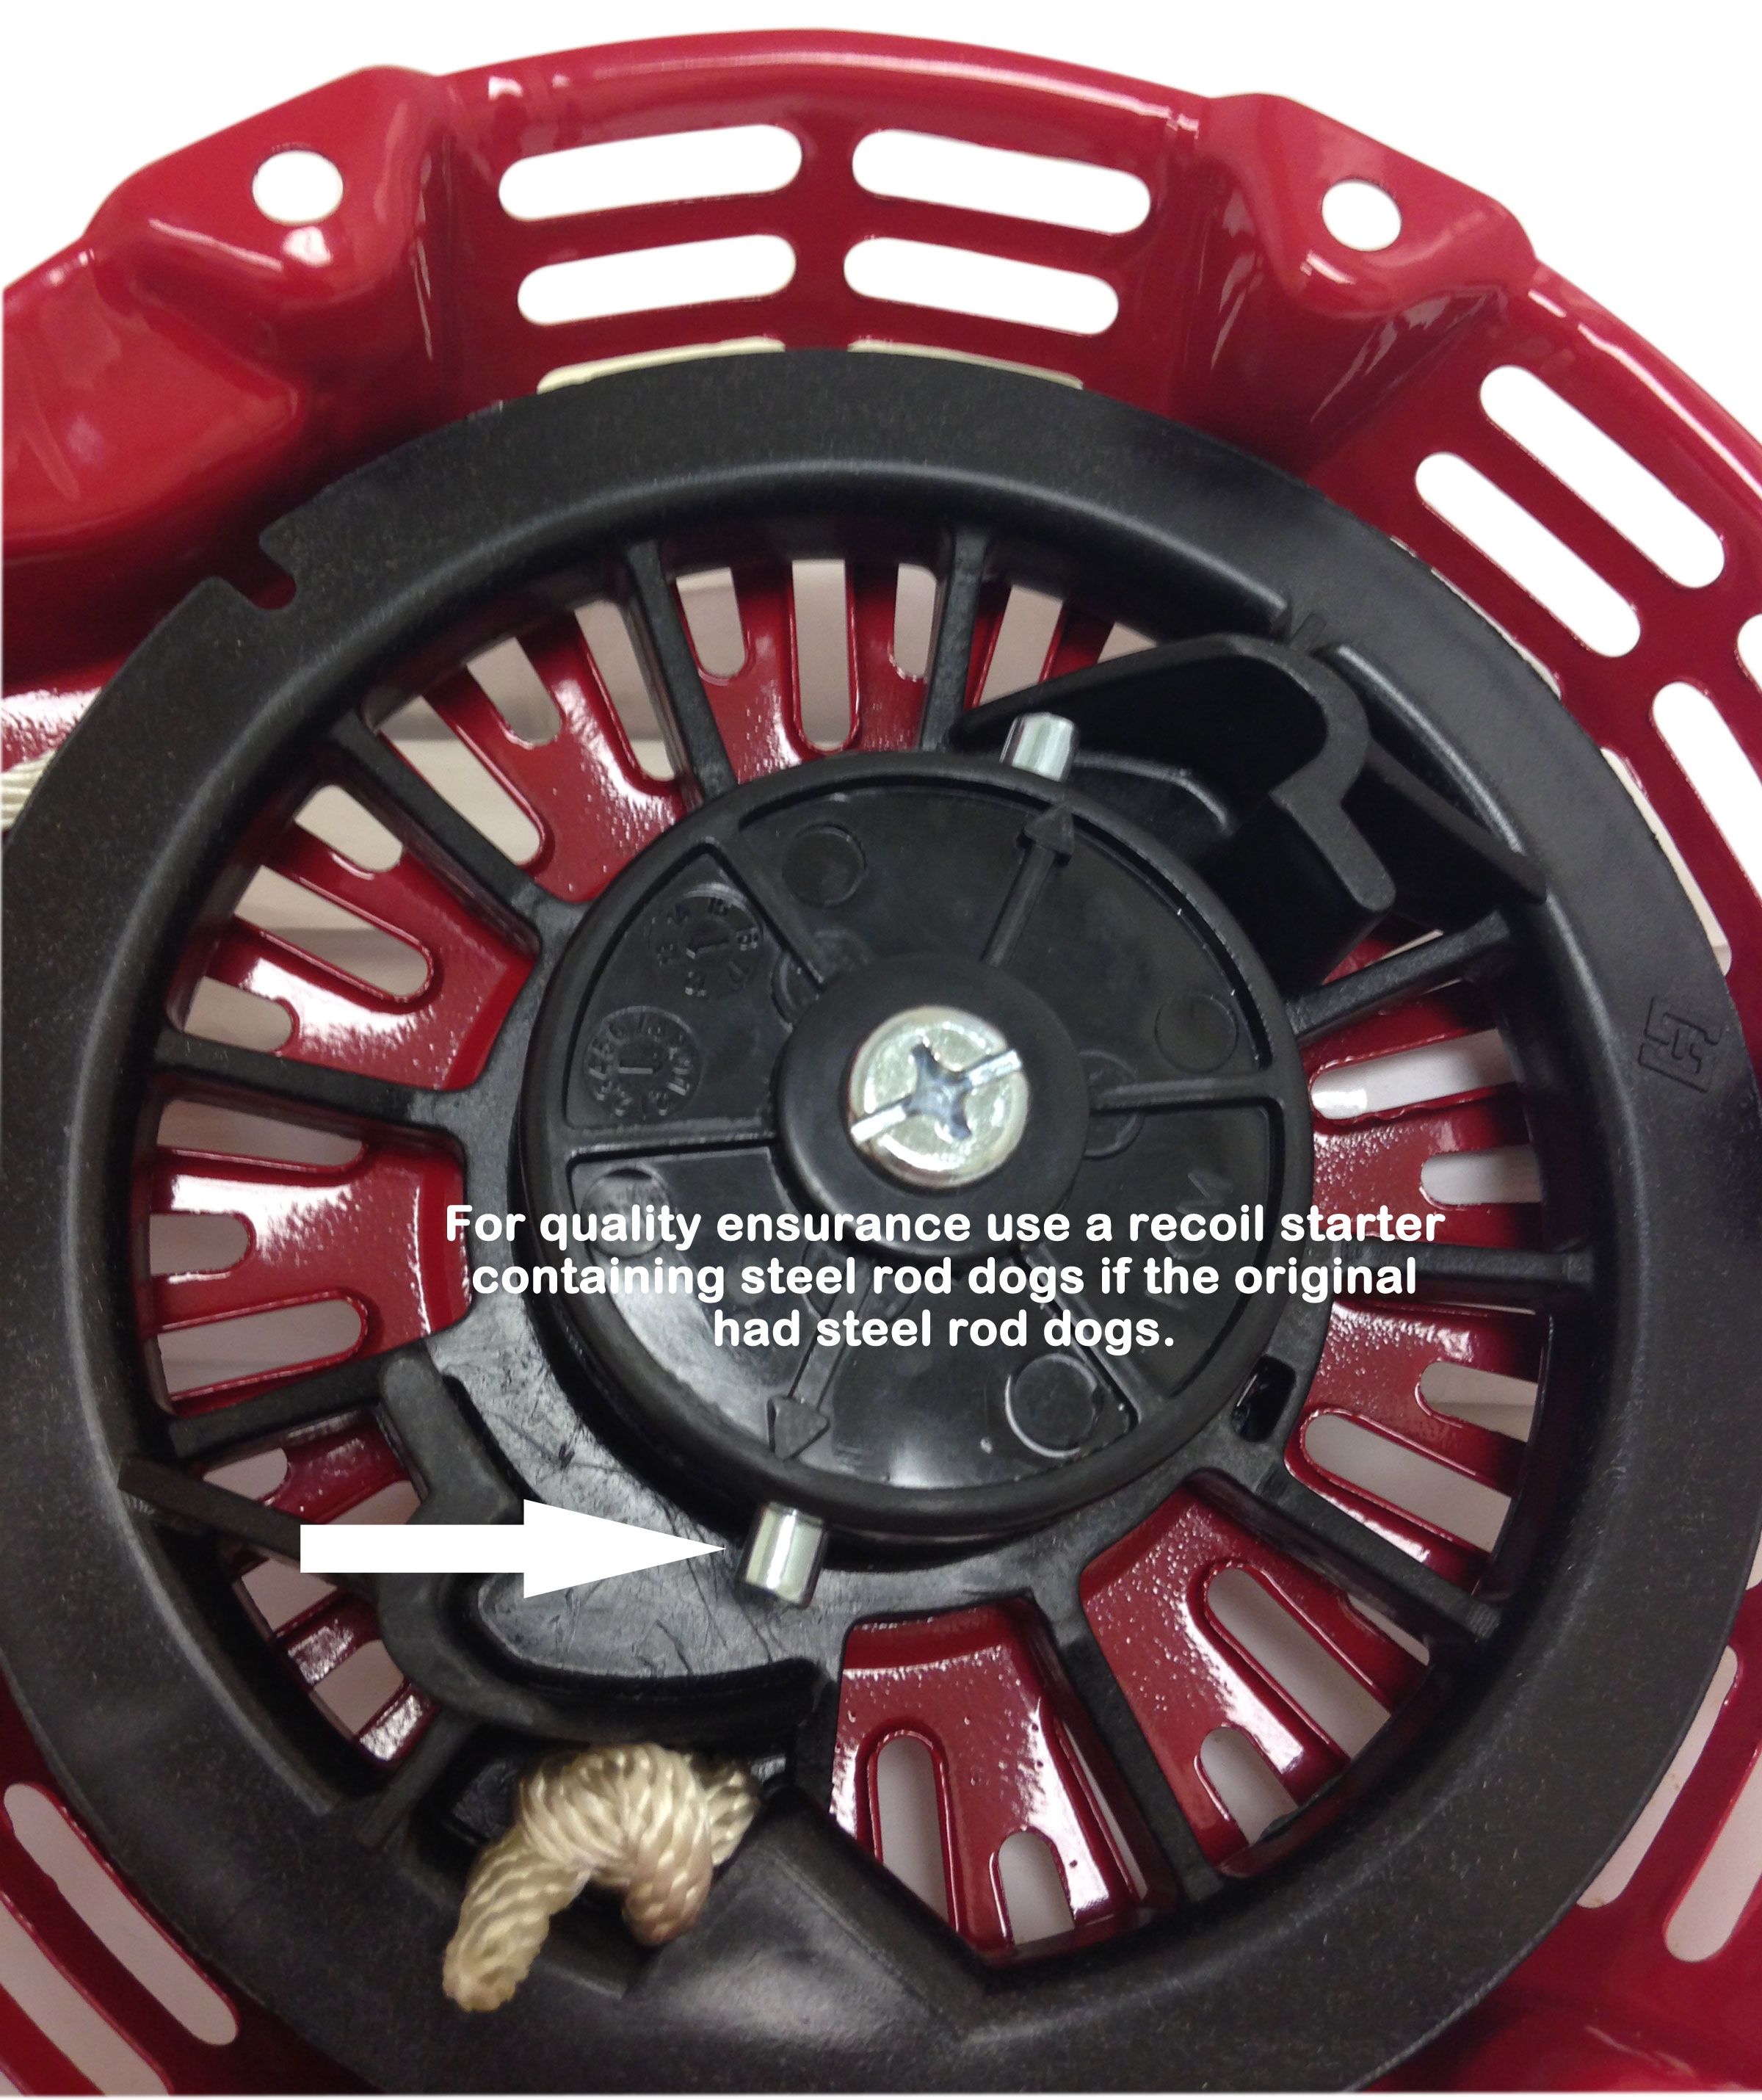 3 x Honda GX160 5.5 hp Recoil Assembly FITS 5.5HP Engine  Steel Rachet